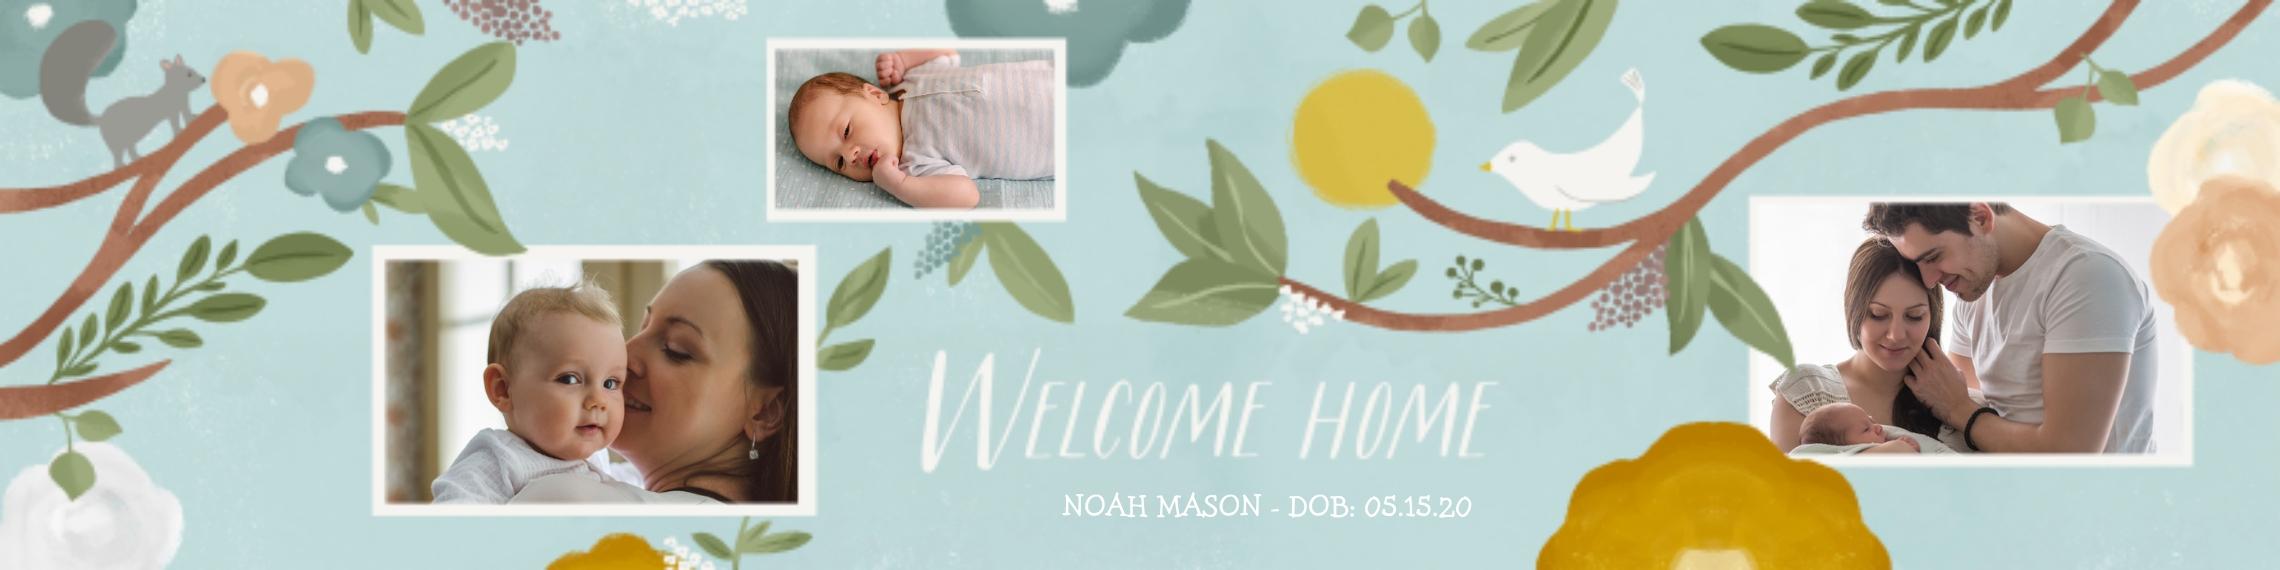 Baby + Kids Vinyl Banner, 2x8, Home Décor -Watercolor Welcome